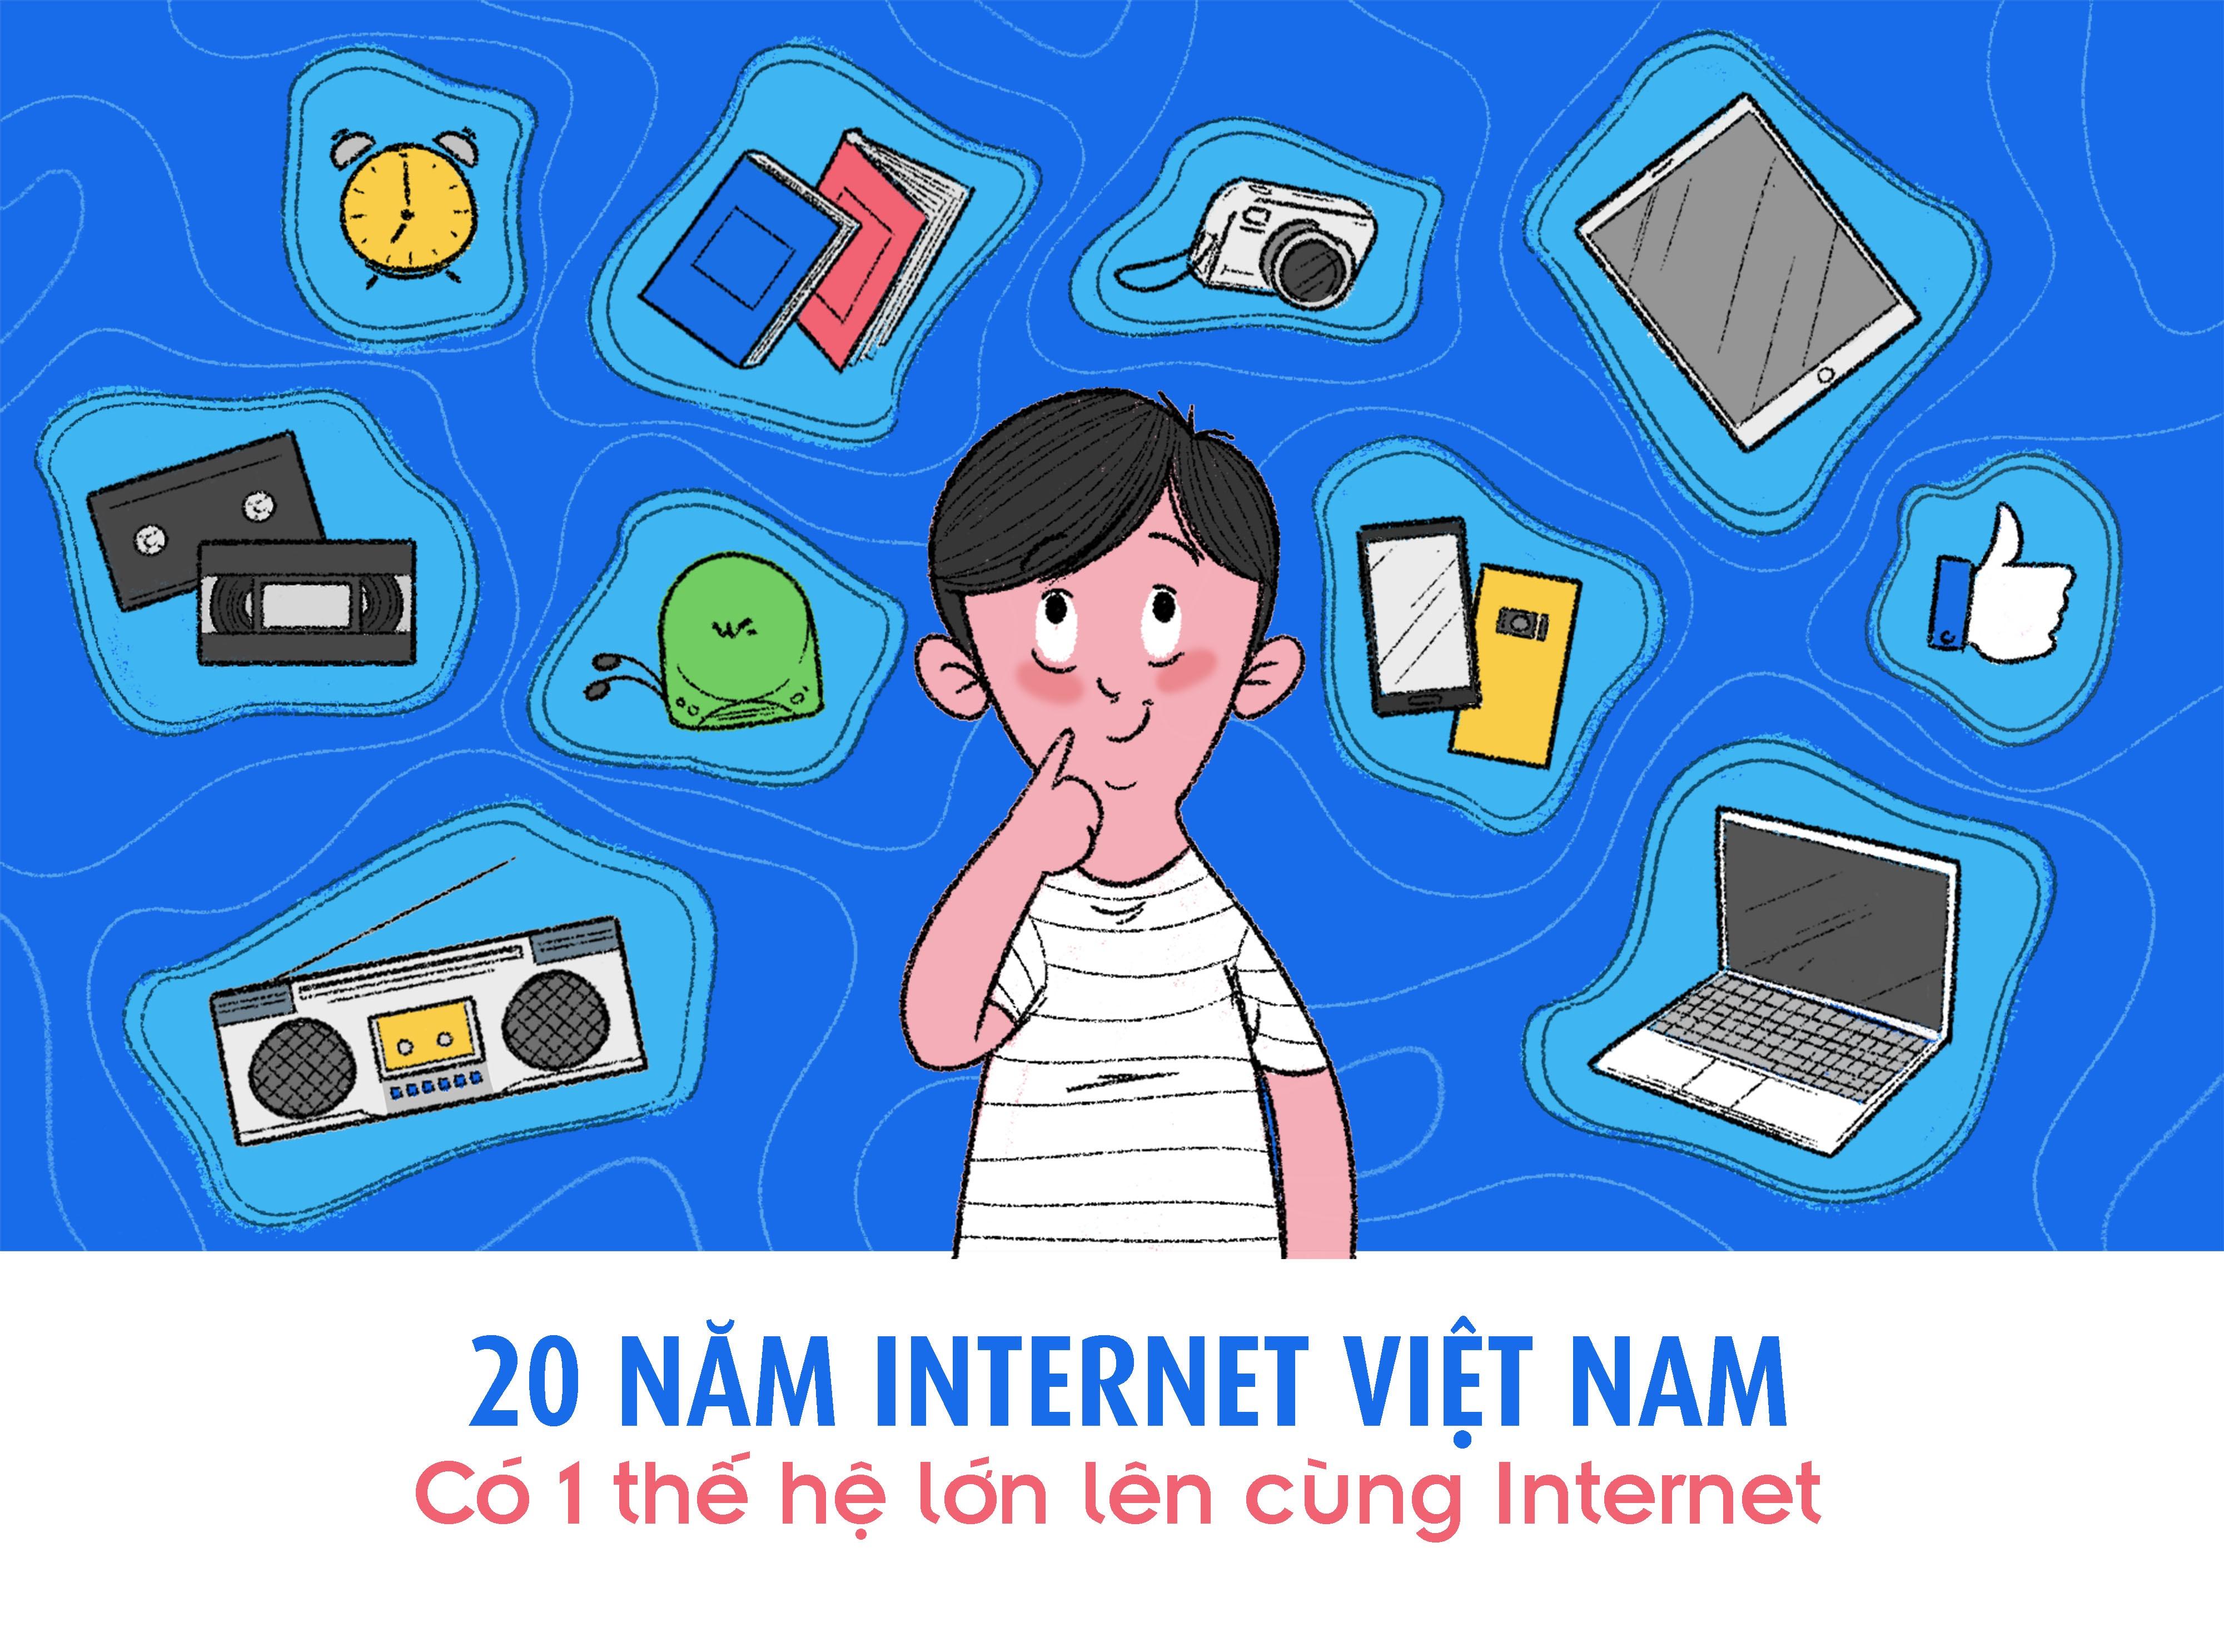 20 nam Internet Viet Nam anh 2